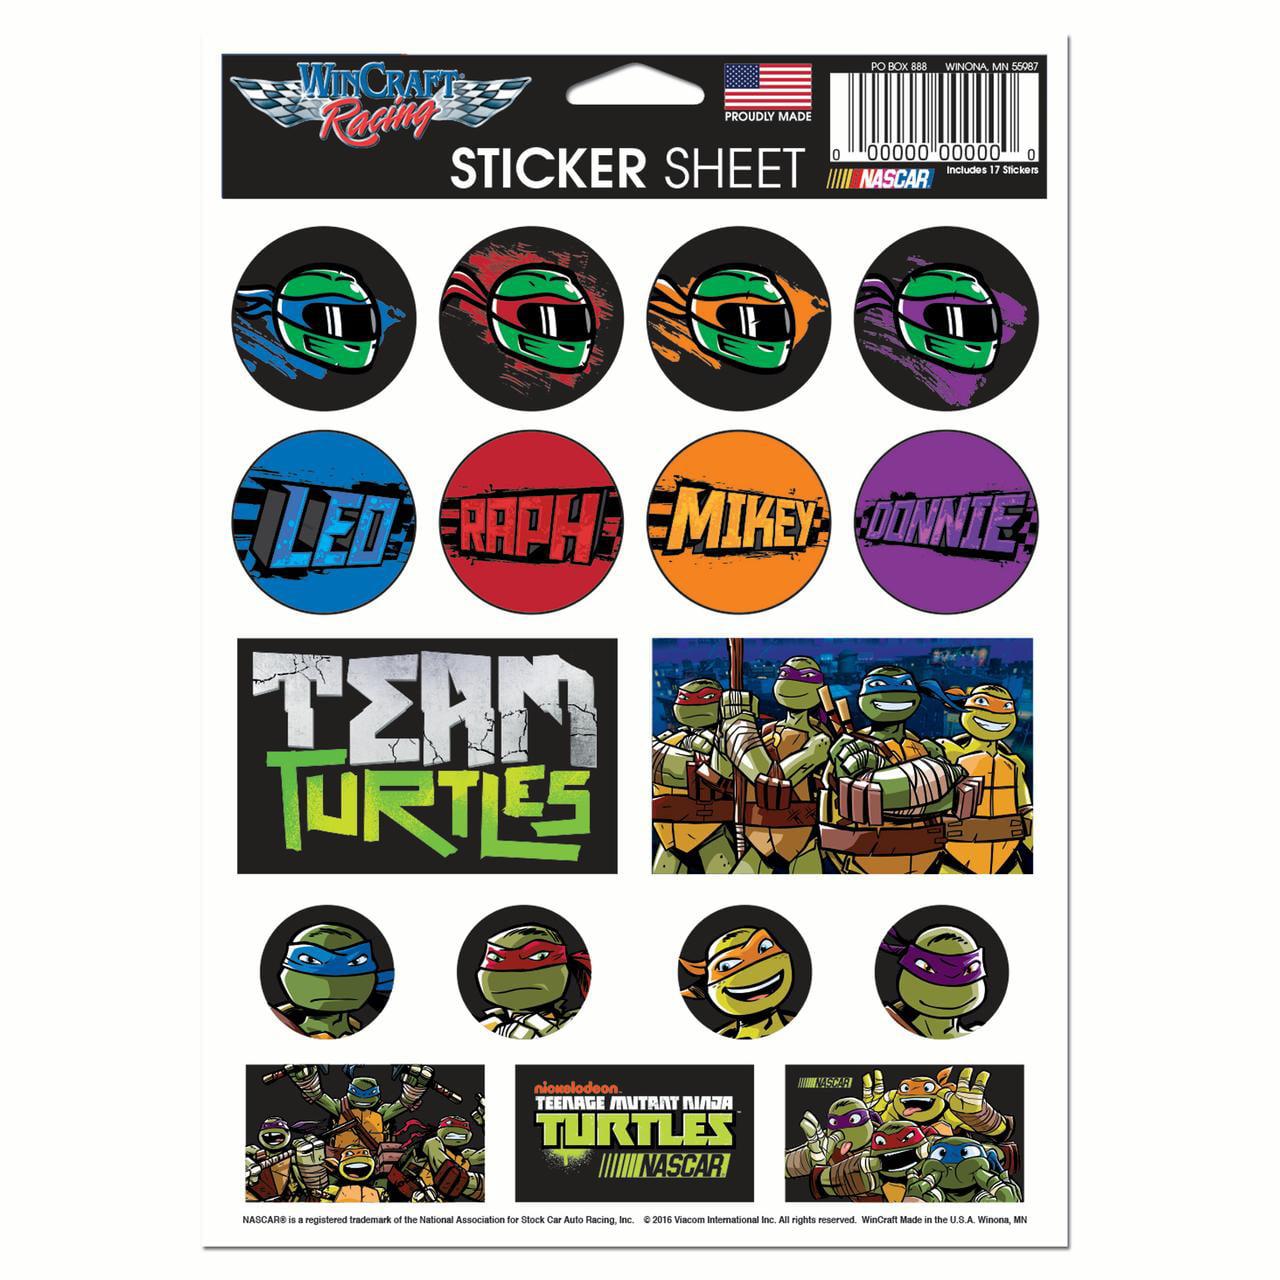 "NASCAR WinCraft 5"" x 7"" Teenage Mutant Ninja Turtles Sticker Sheet - No Size"